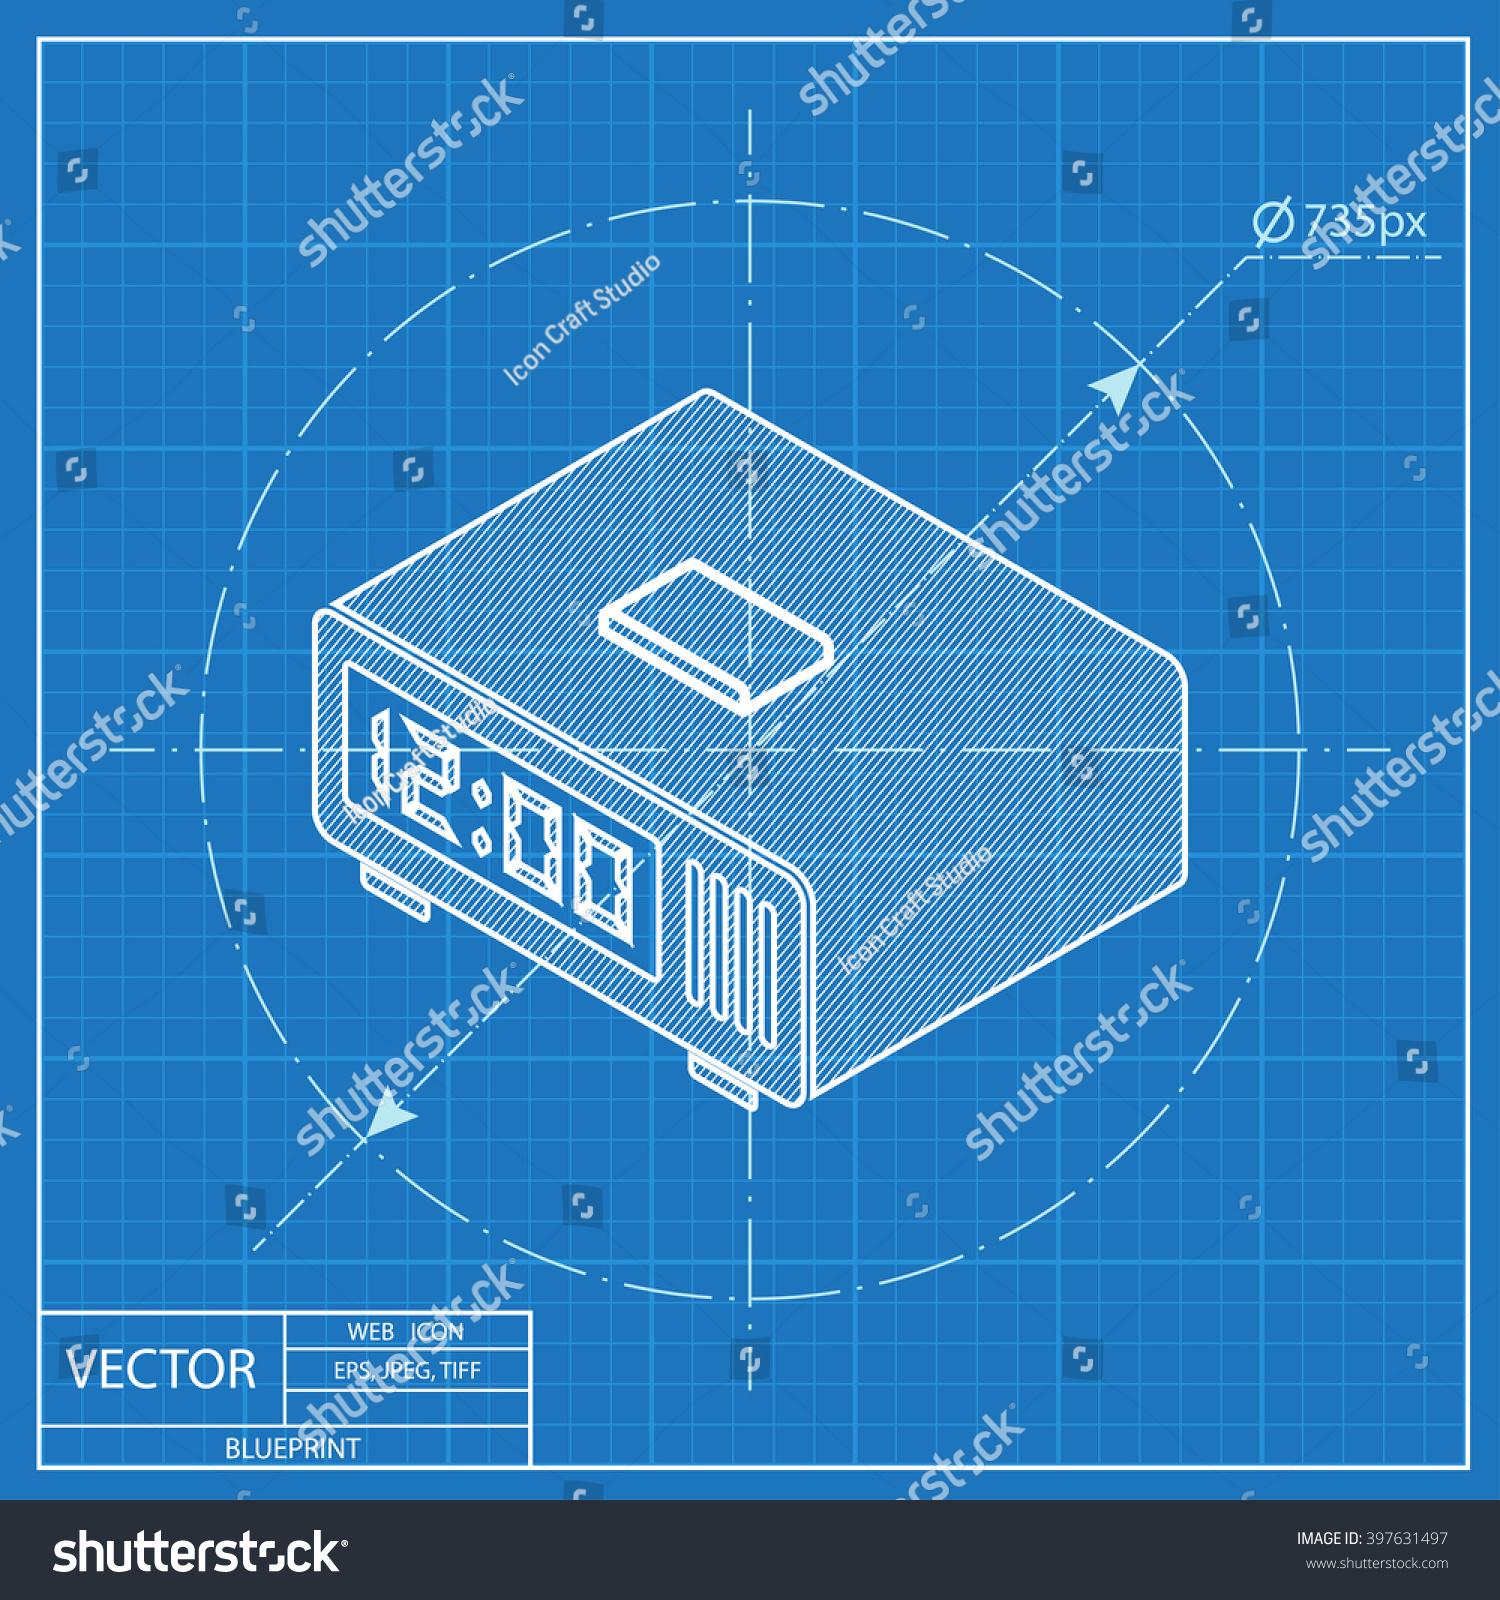 Digital alarm clock isometric 3d blueprint stock vector 397631497 digital alarm clock isometric 3d blueprint stock vector 397631497 shutterstock malvernweather Gallery